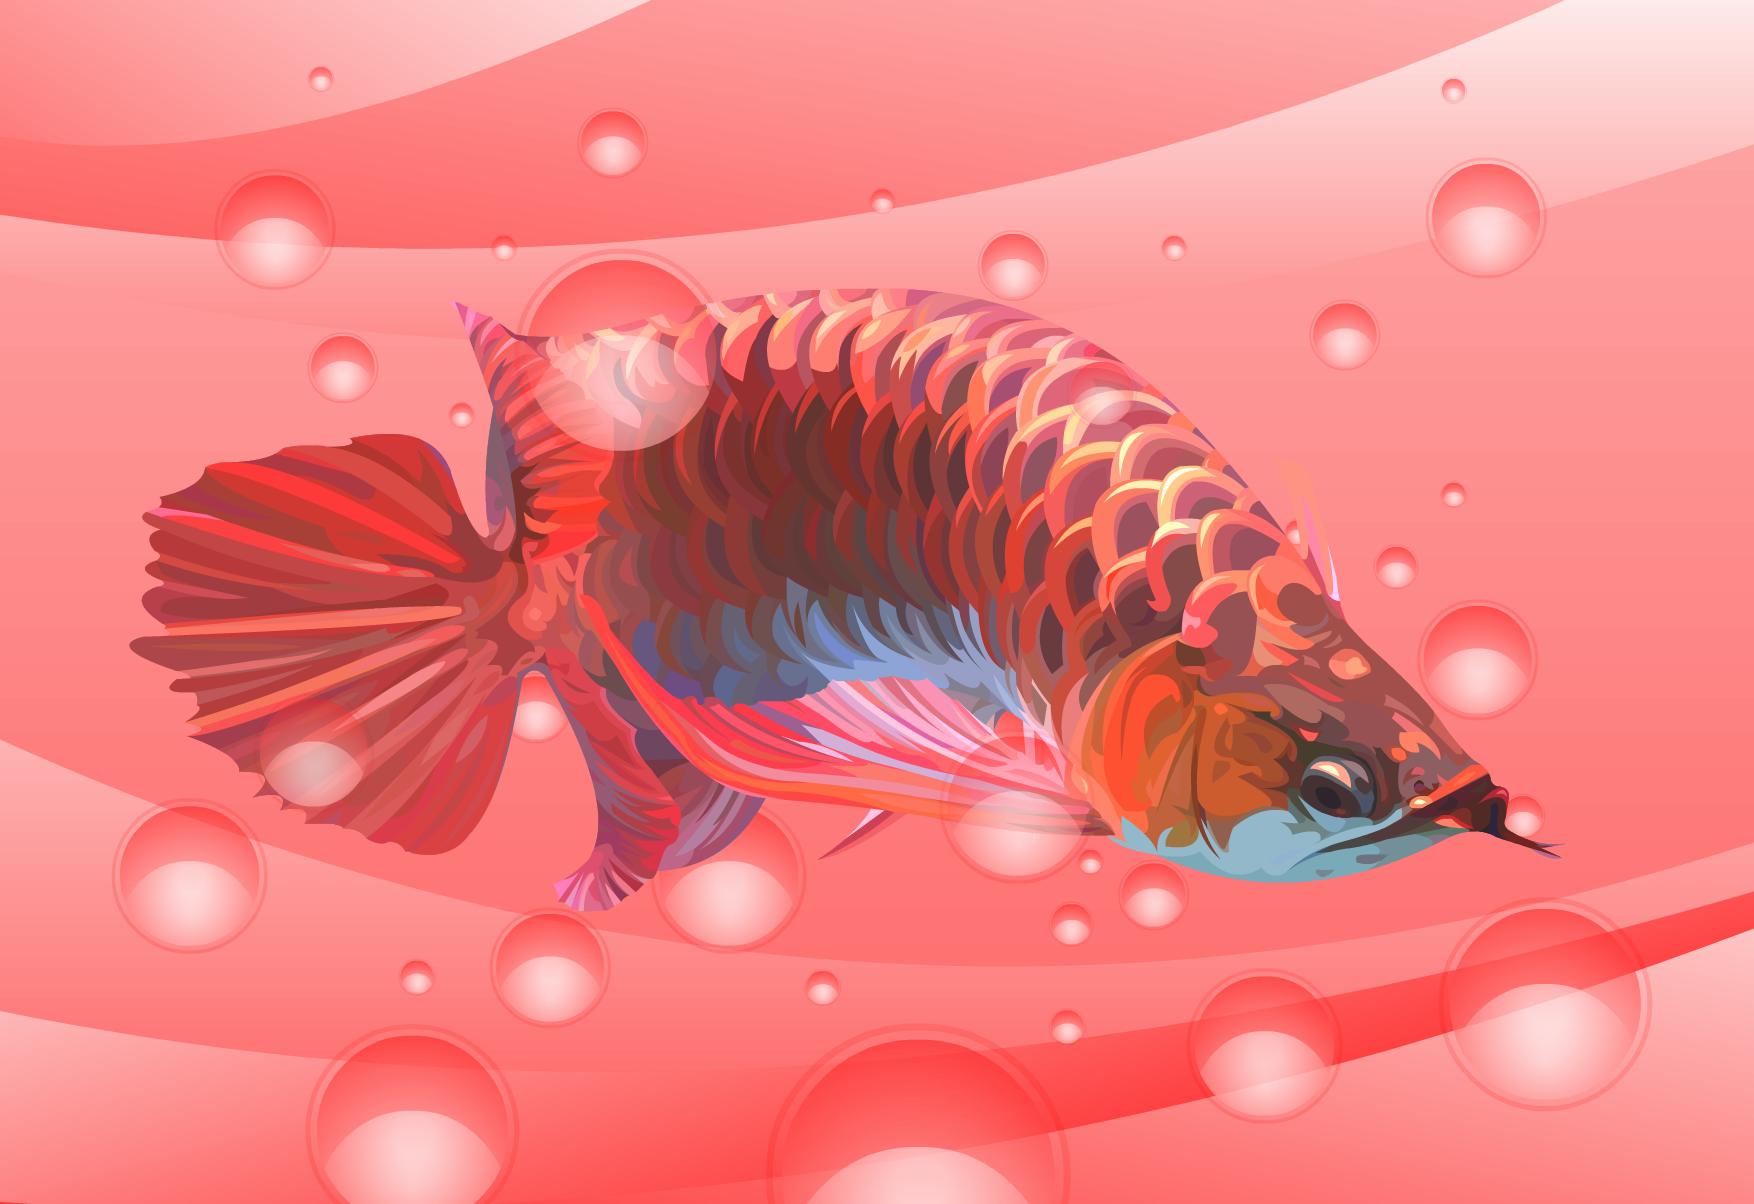 Red Arowana Vector 2 By Angga2110 On Deviantart Ikan Perhiasan